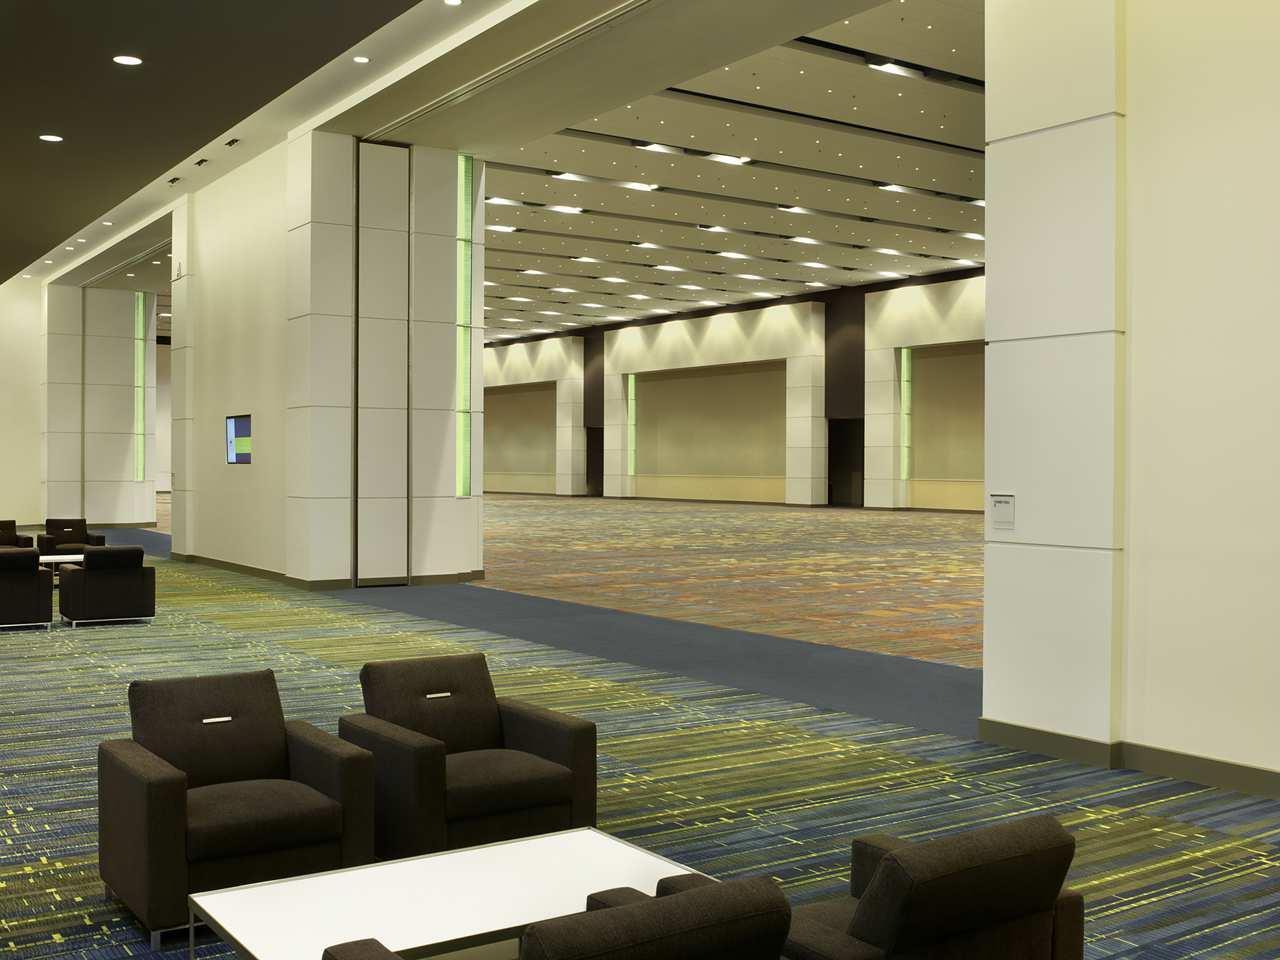 DoubleTree by Hilton Hotel Cedar Rapids Convention Complex image 23